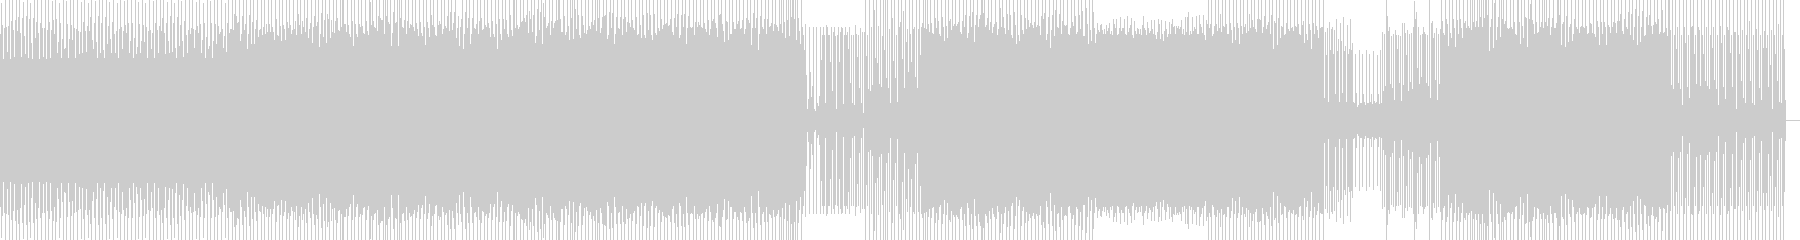 minimal house 31 の未再生の波形